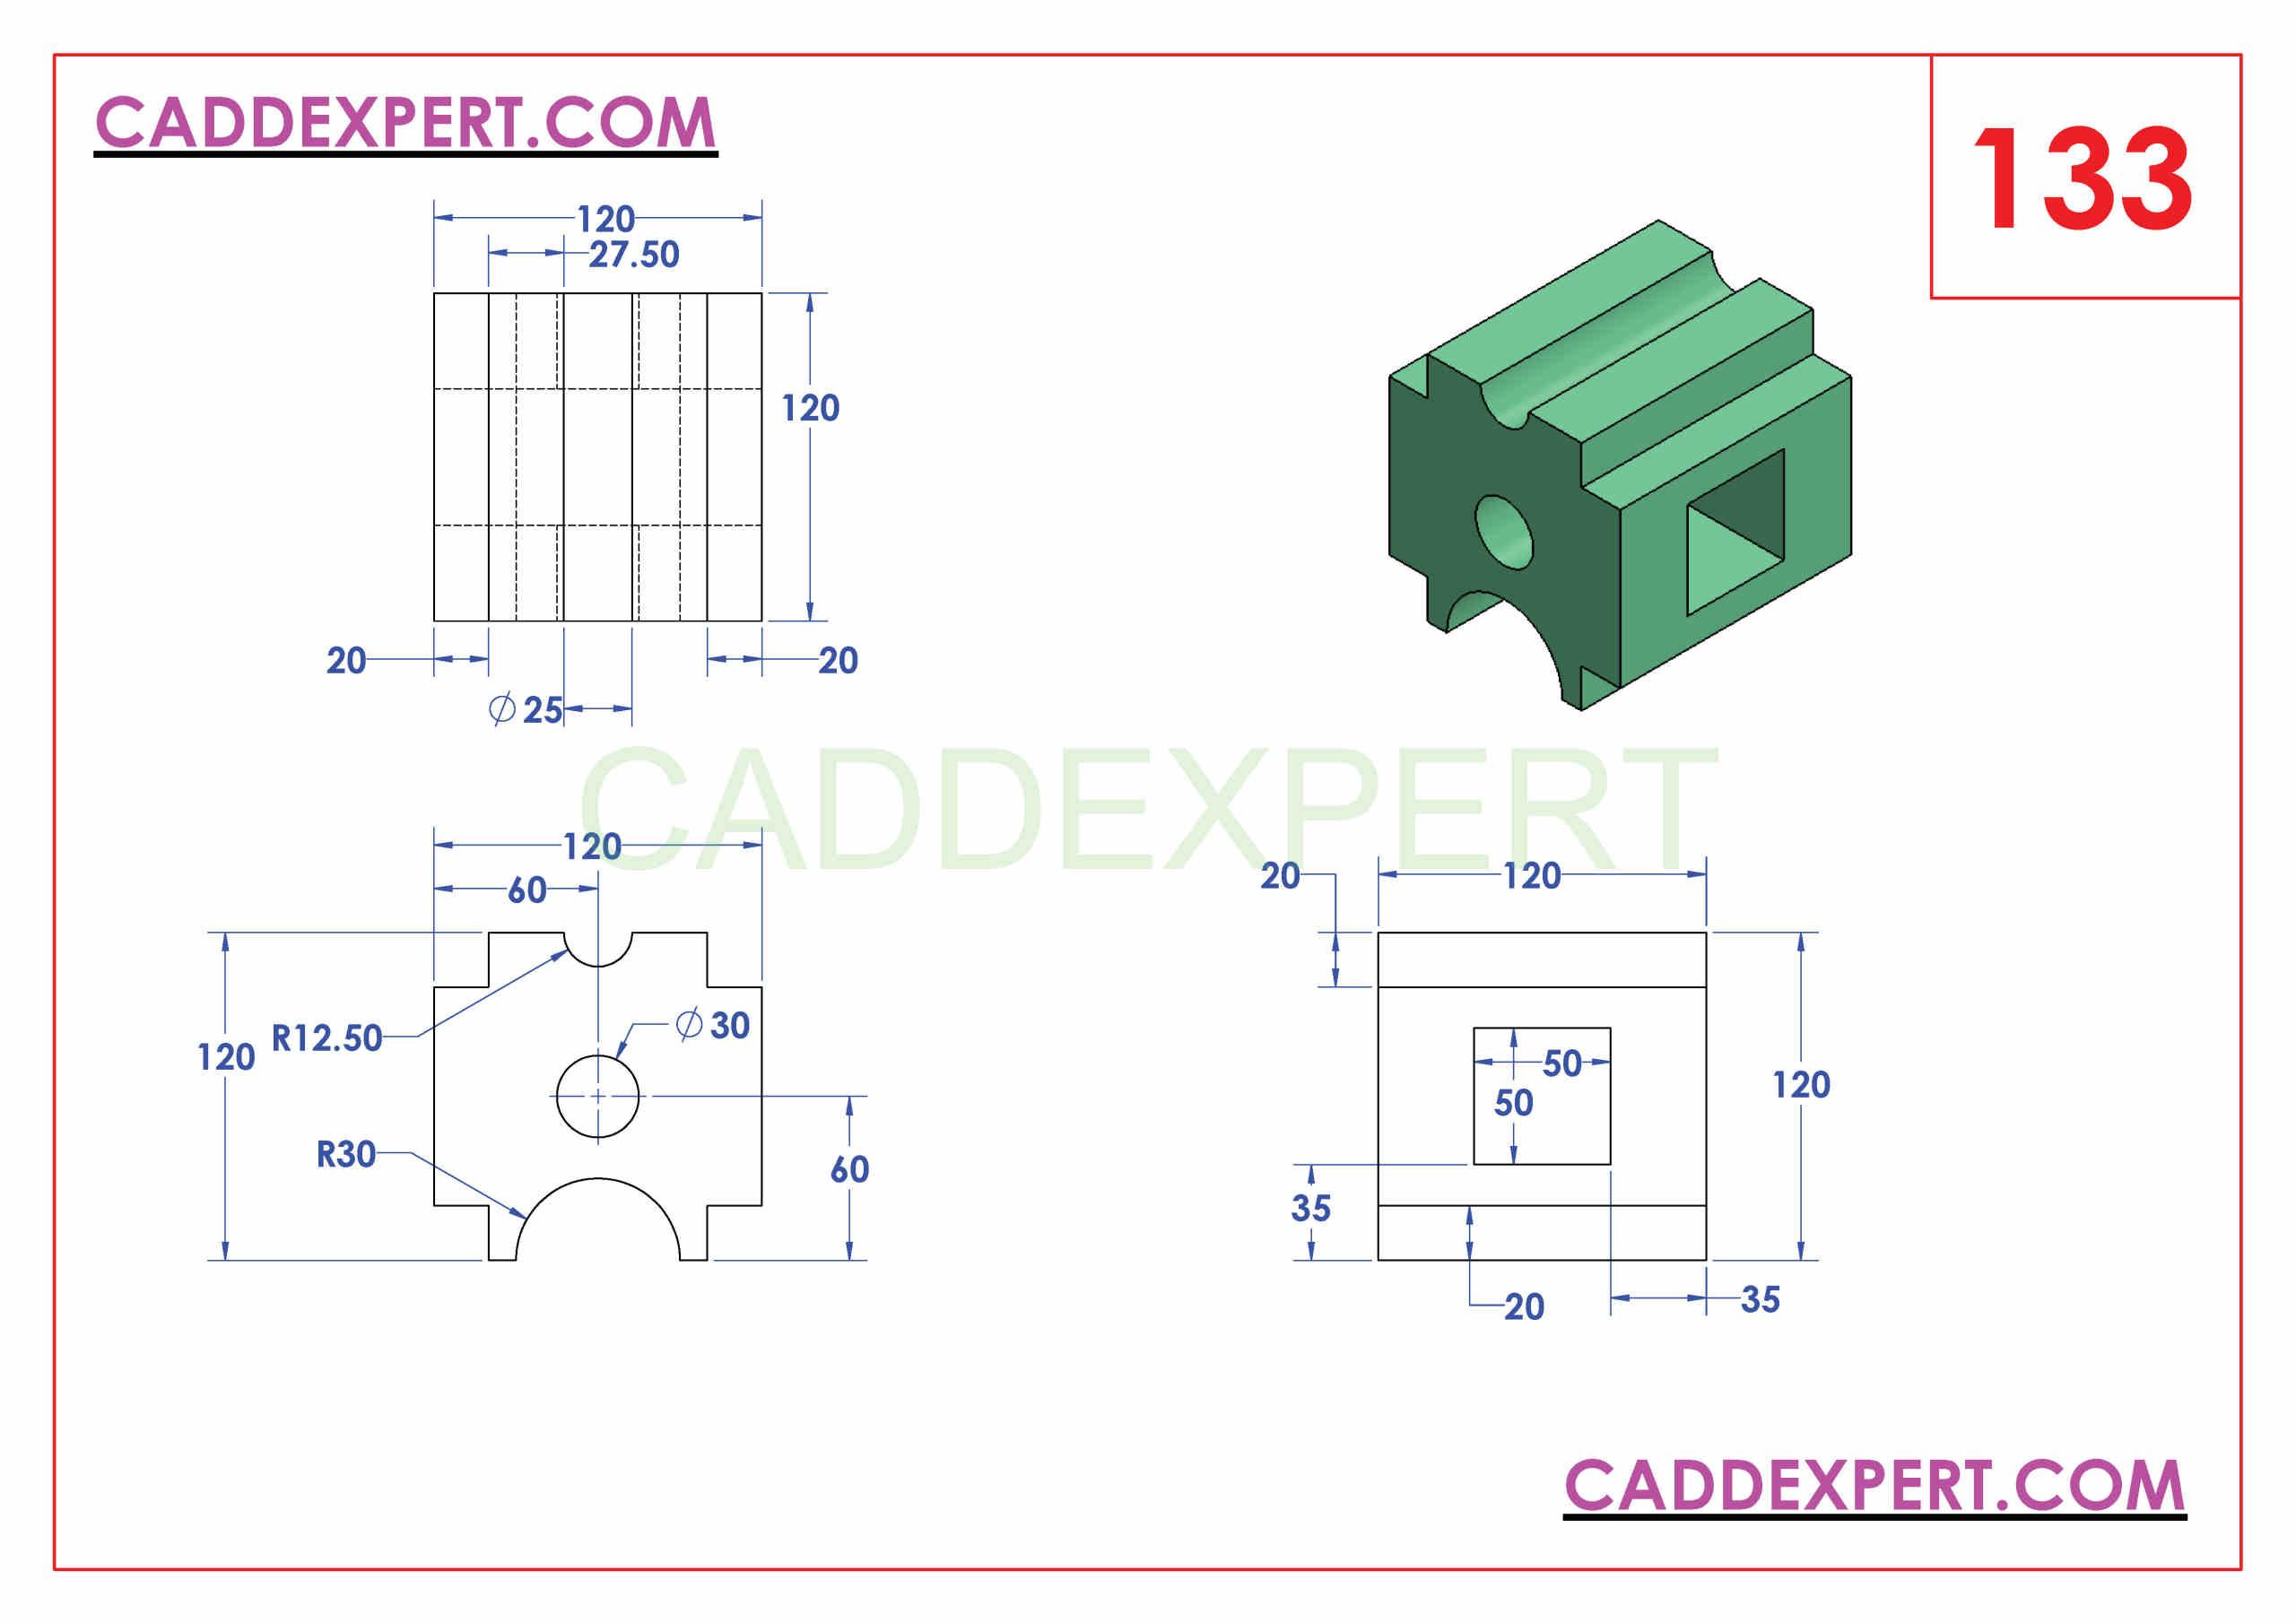 SOLIDWORKS CATIA NX AUTOCAD 3D DRAWINGS PRACTICE BOOKS 100 PDF -133